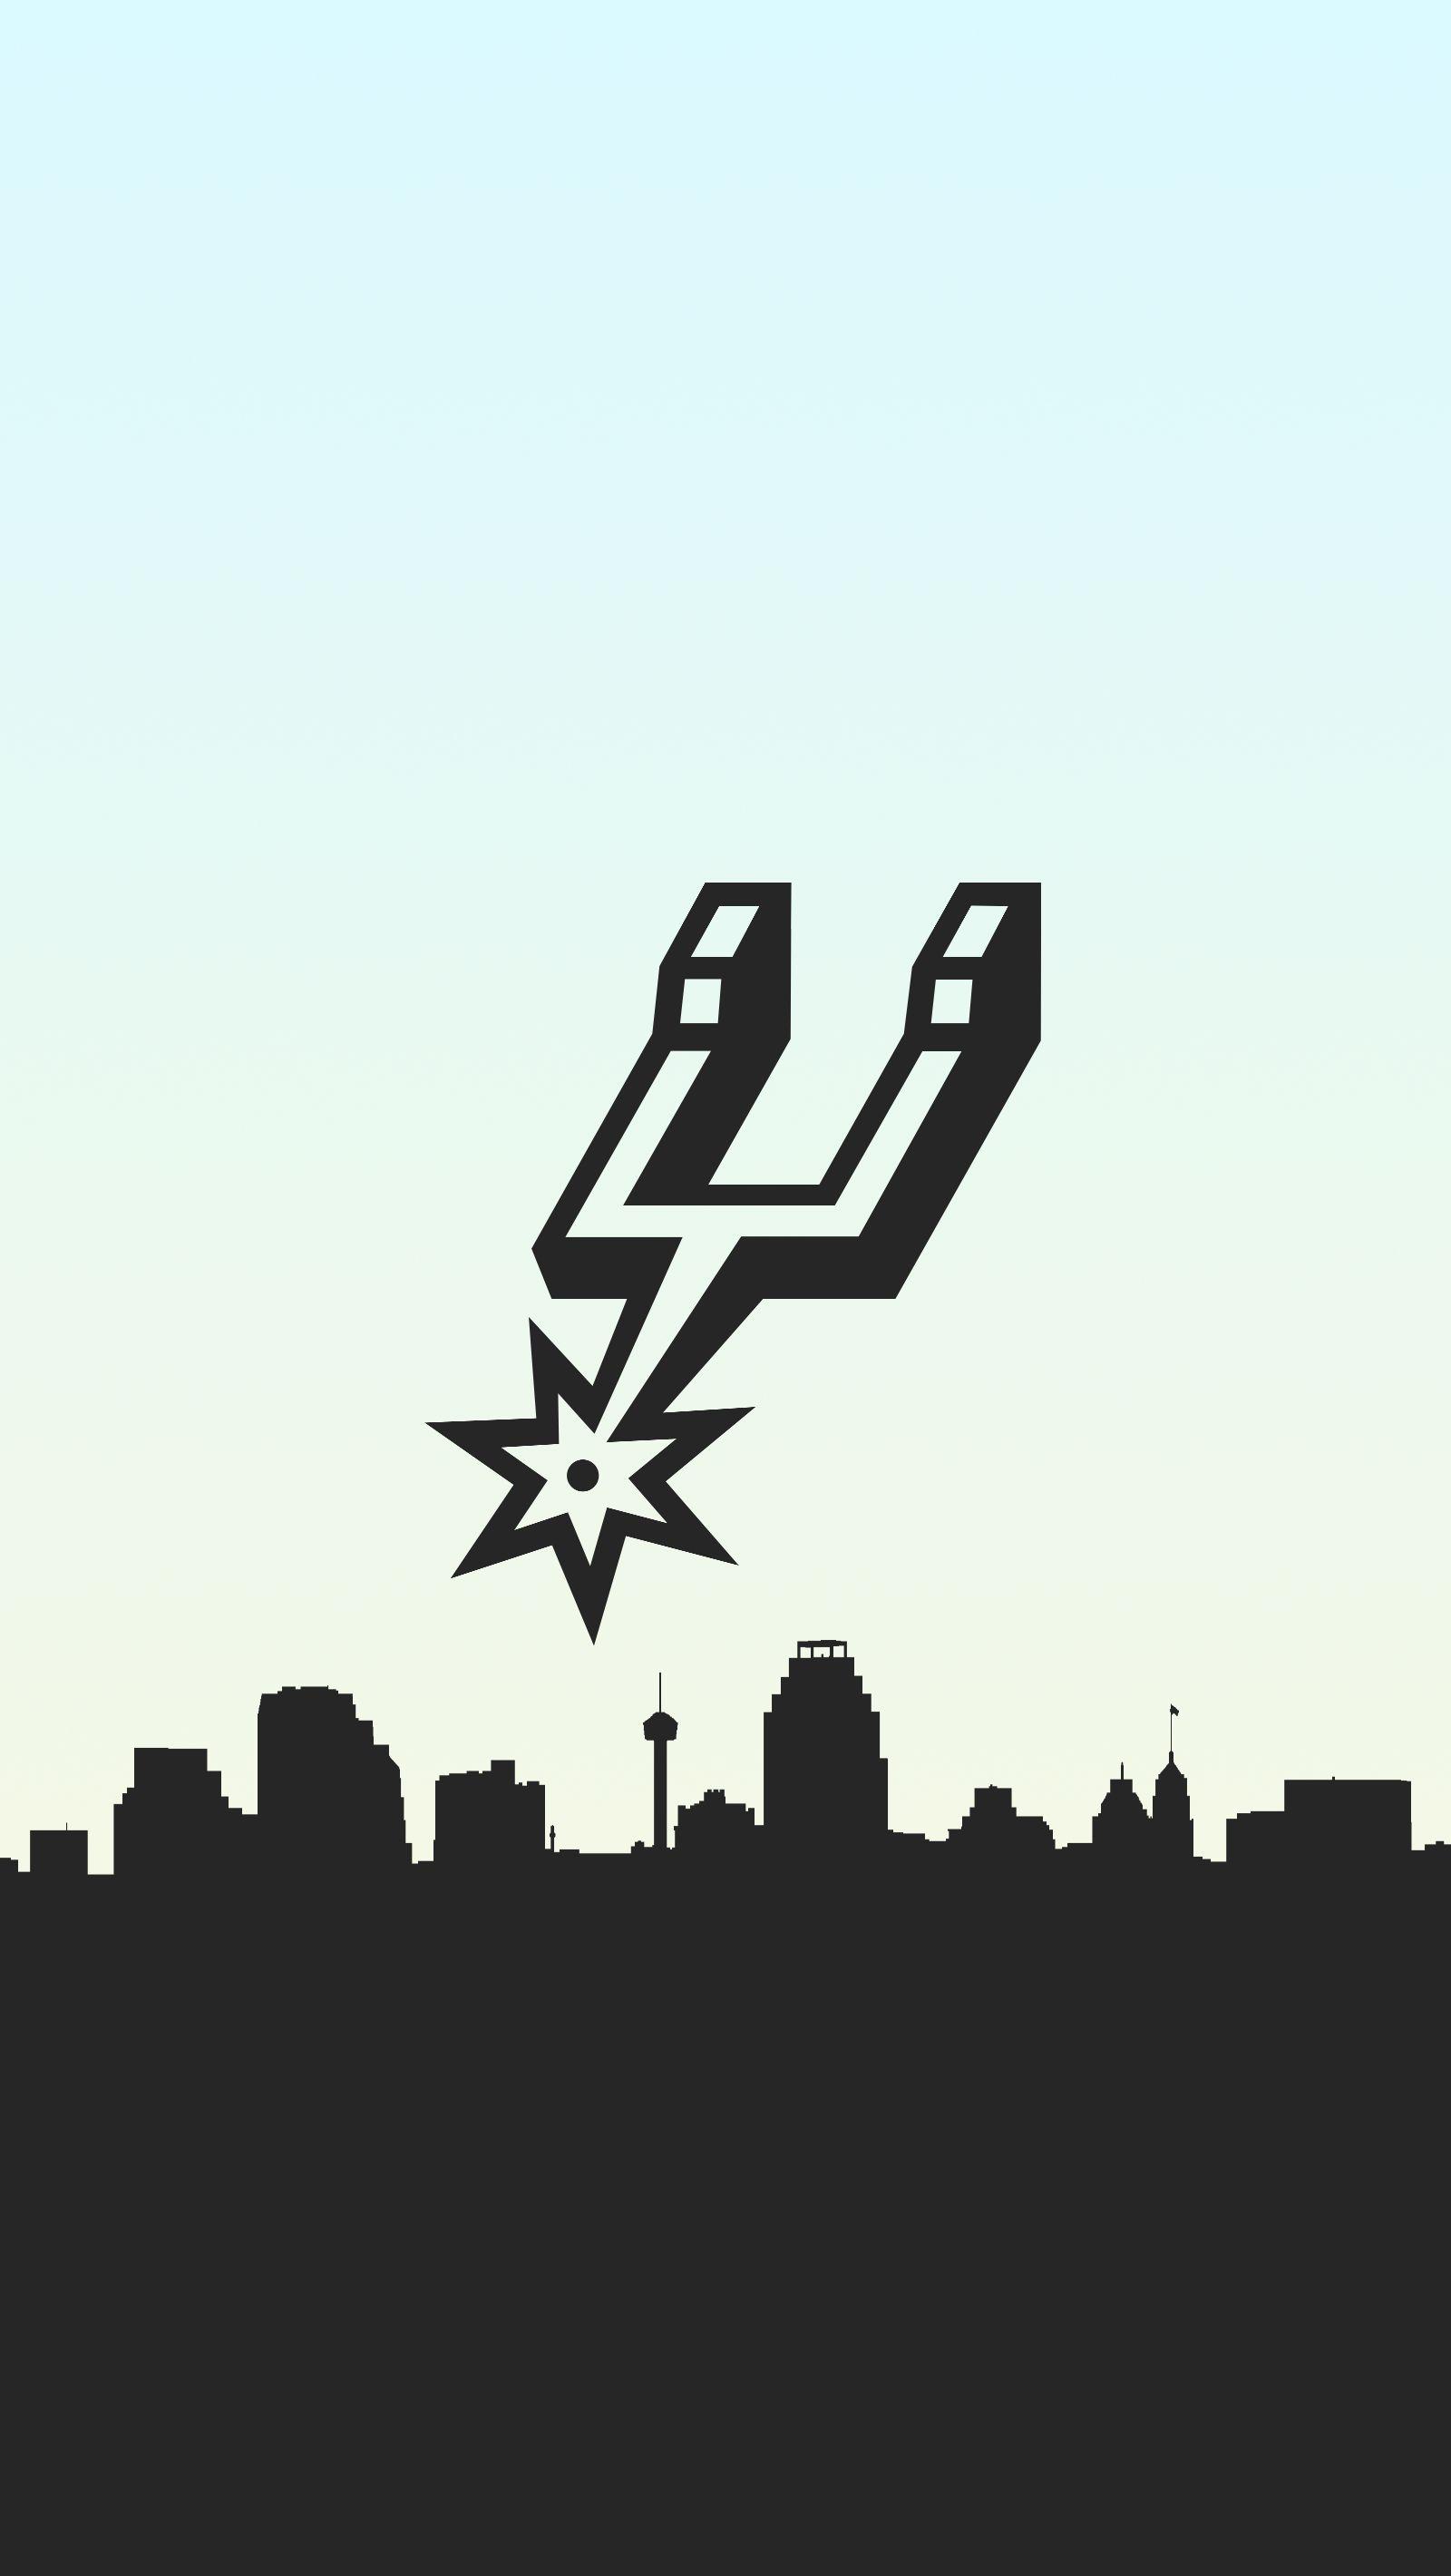 San Antonio Spurs Basketball Phone Background In 2020 San Antonio Spurs Basketball San Antonio Spurs Logo Spurs Basketball